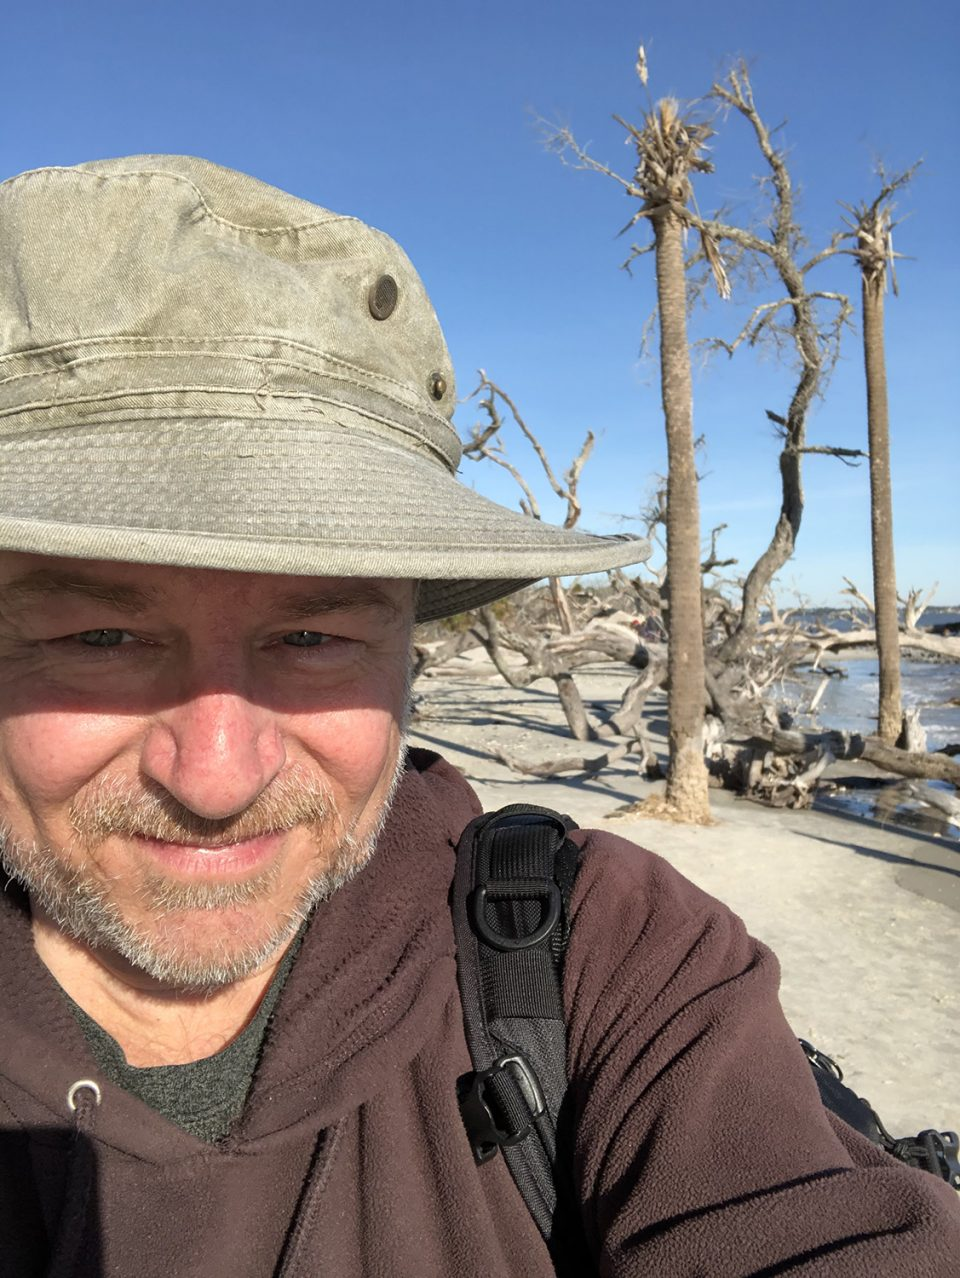 A rare selfie of fine art photographer Keith Dotson among the tree skeletons on Driftwood Beach at Jekyll Island, Georgia